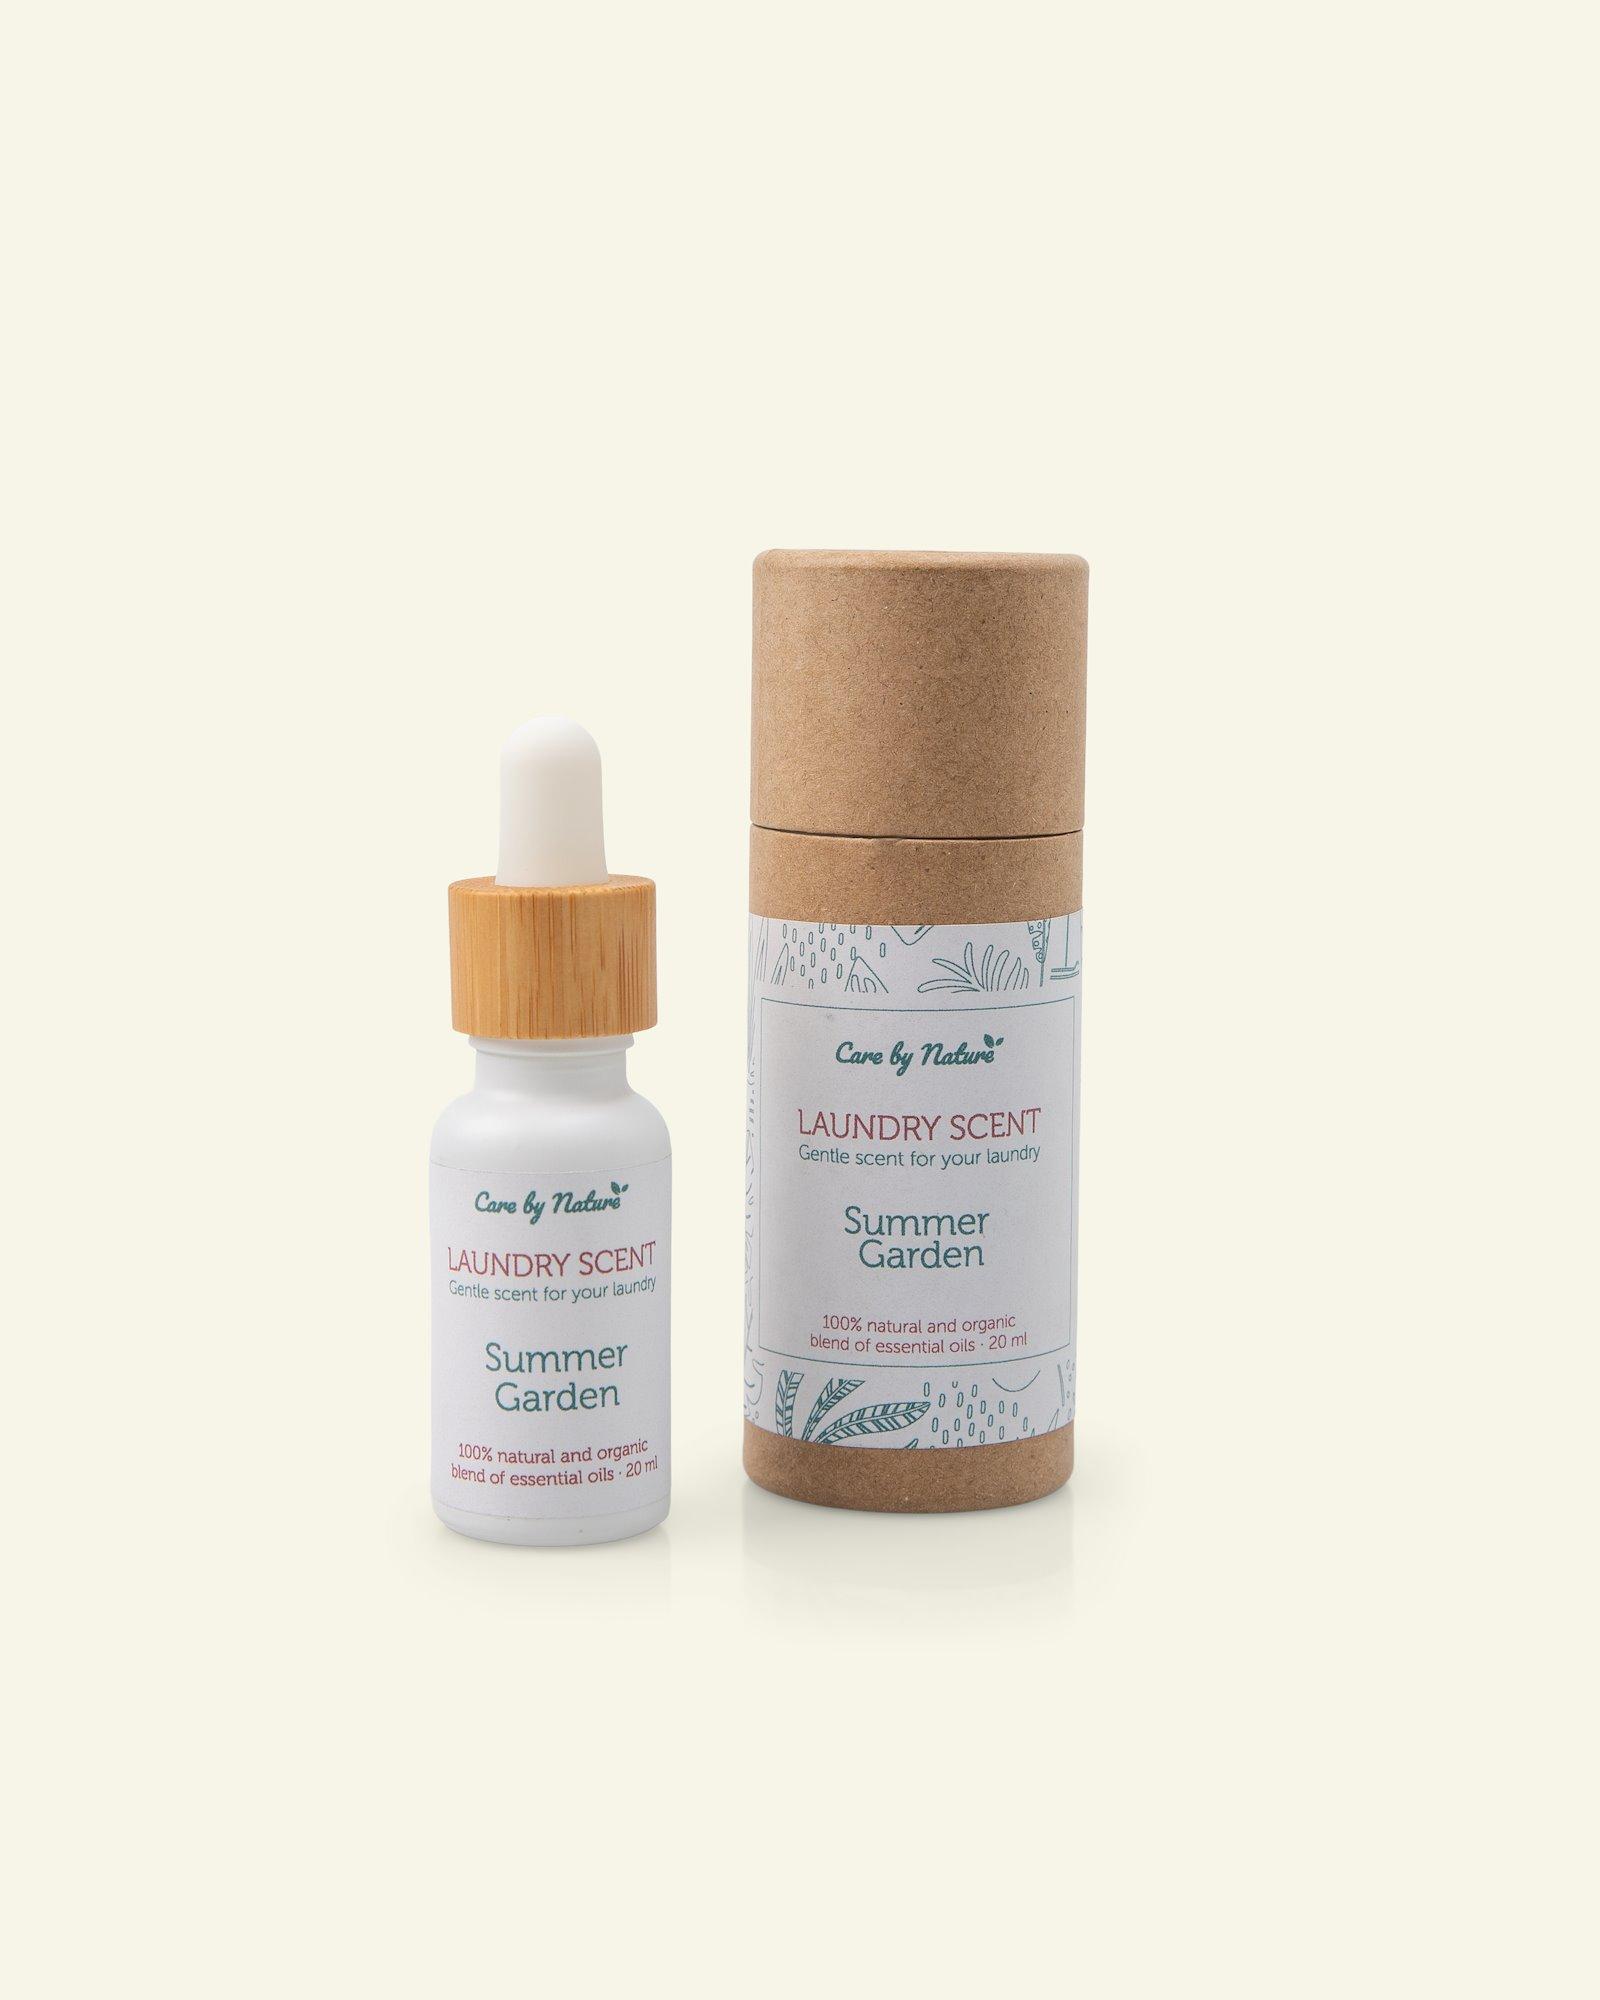 Laundry scent / essential oils Summer